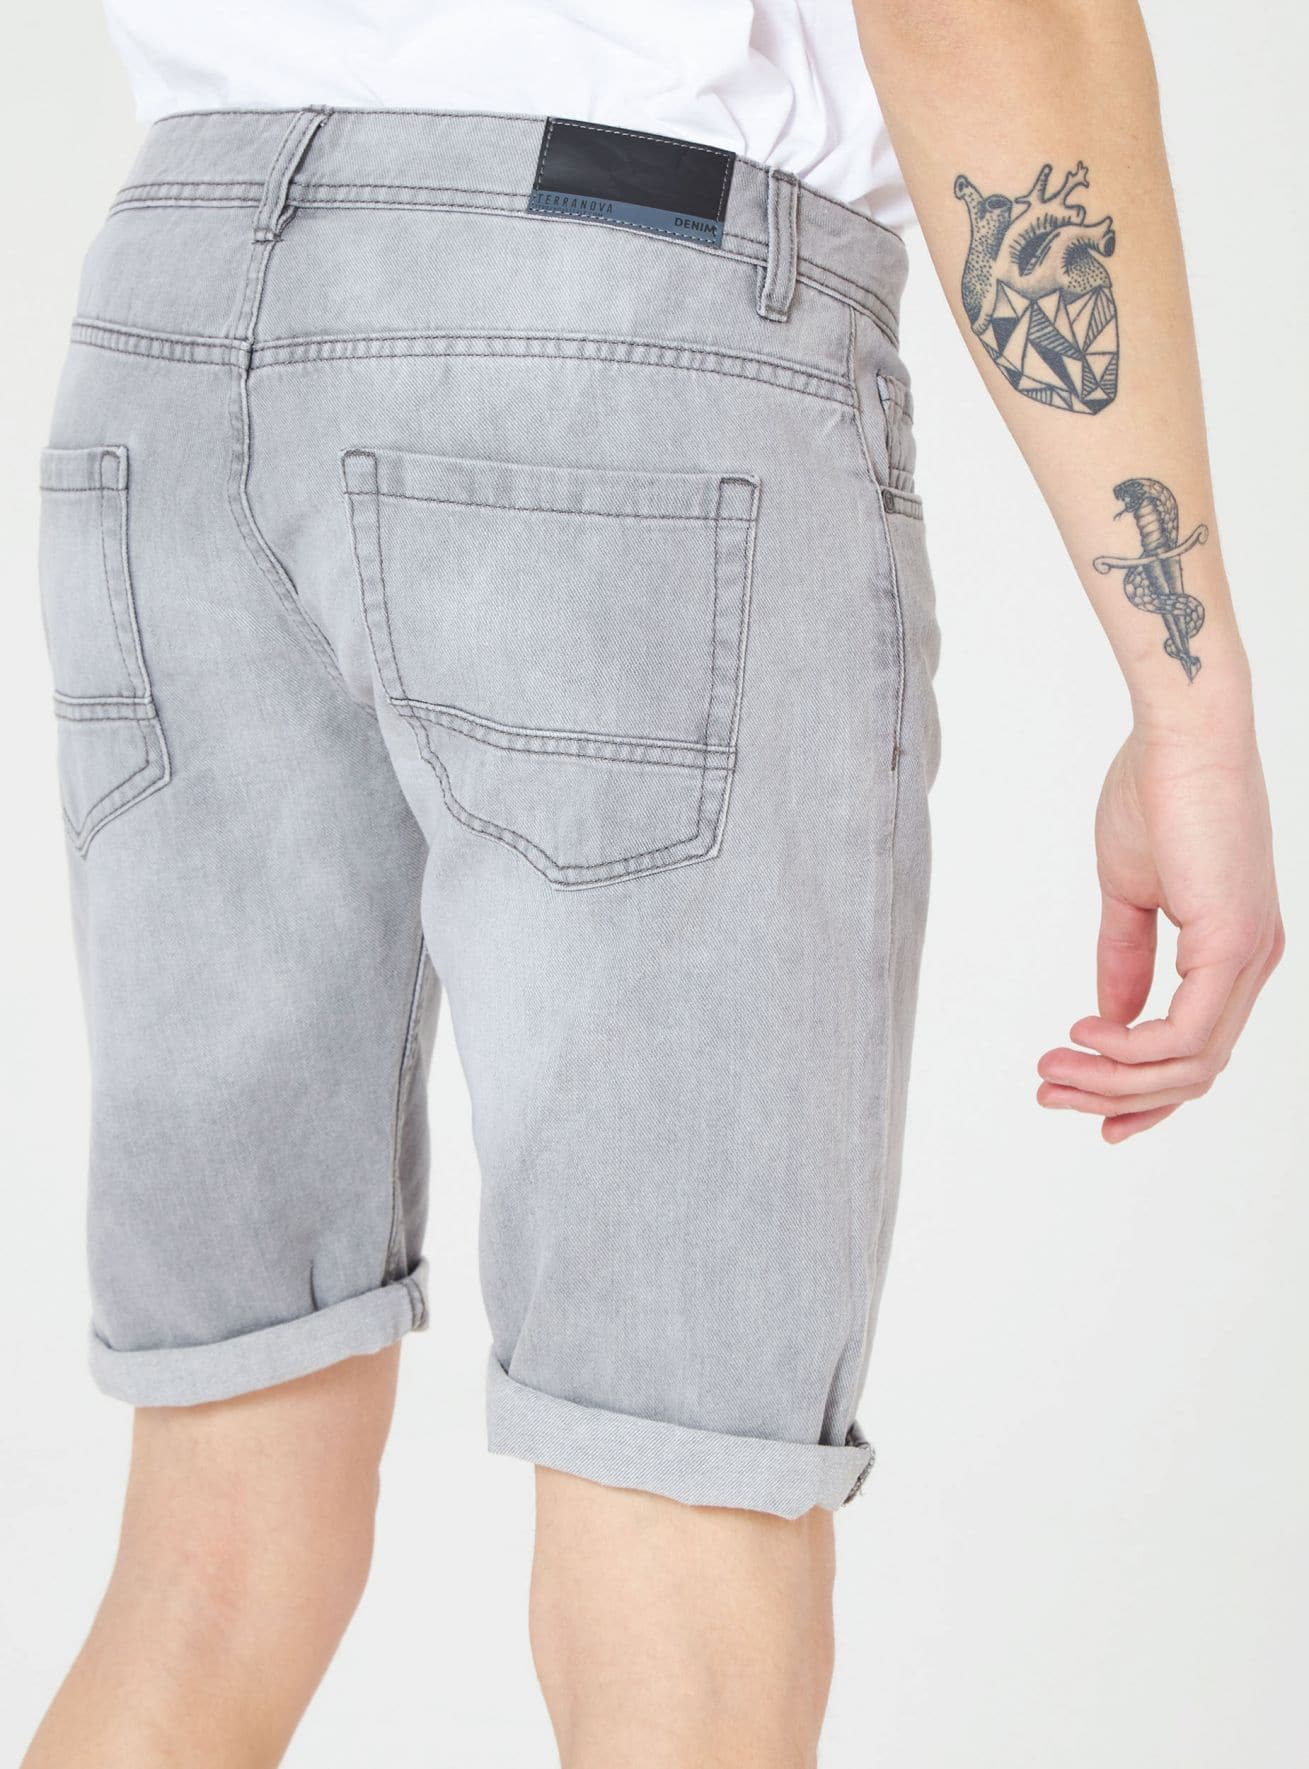 Pantalone Jeans Corto Herren Terranova